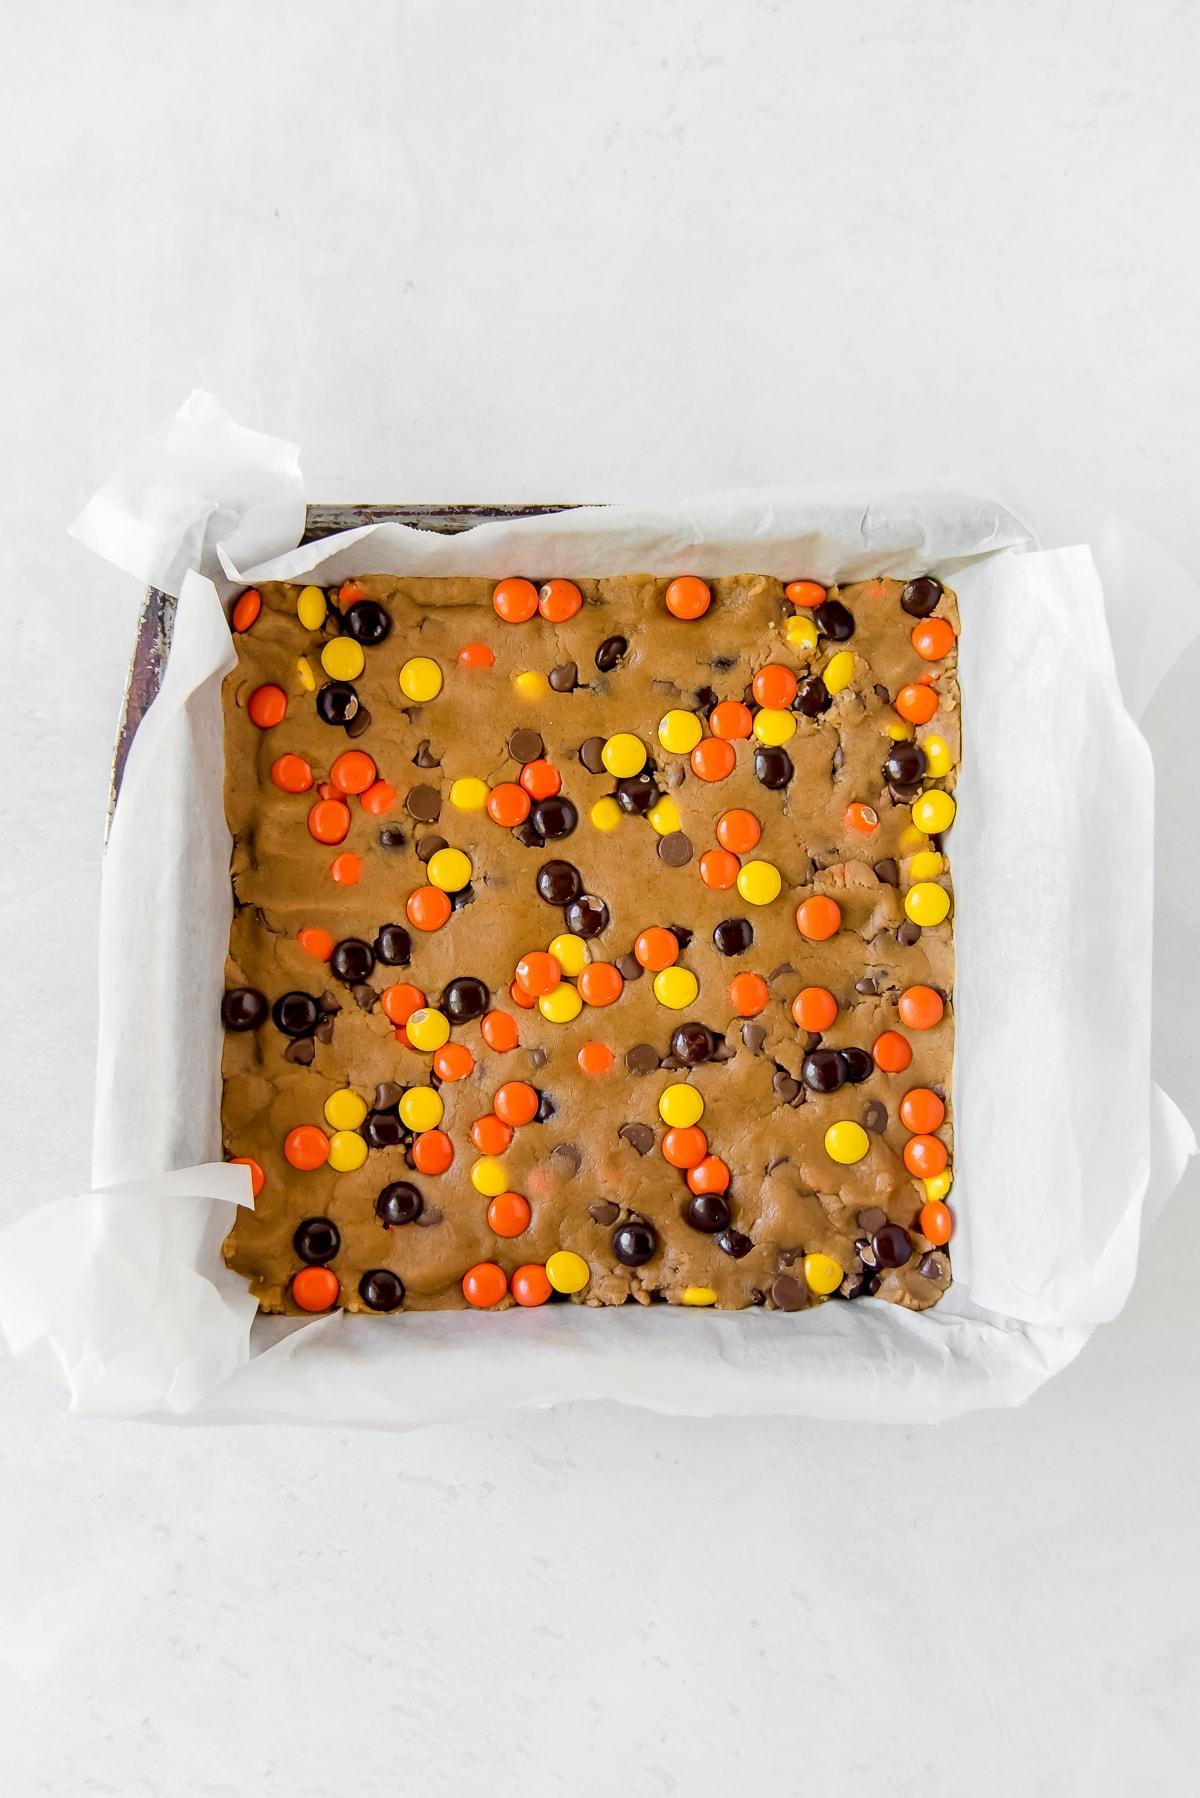 reeses pieces peanut butter blondies dough presses into parchment-lined square baking pan